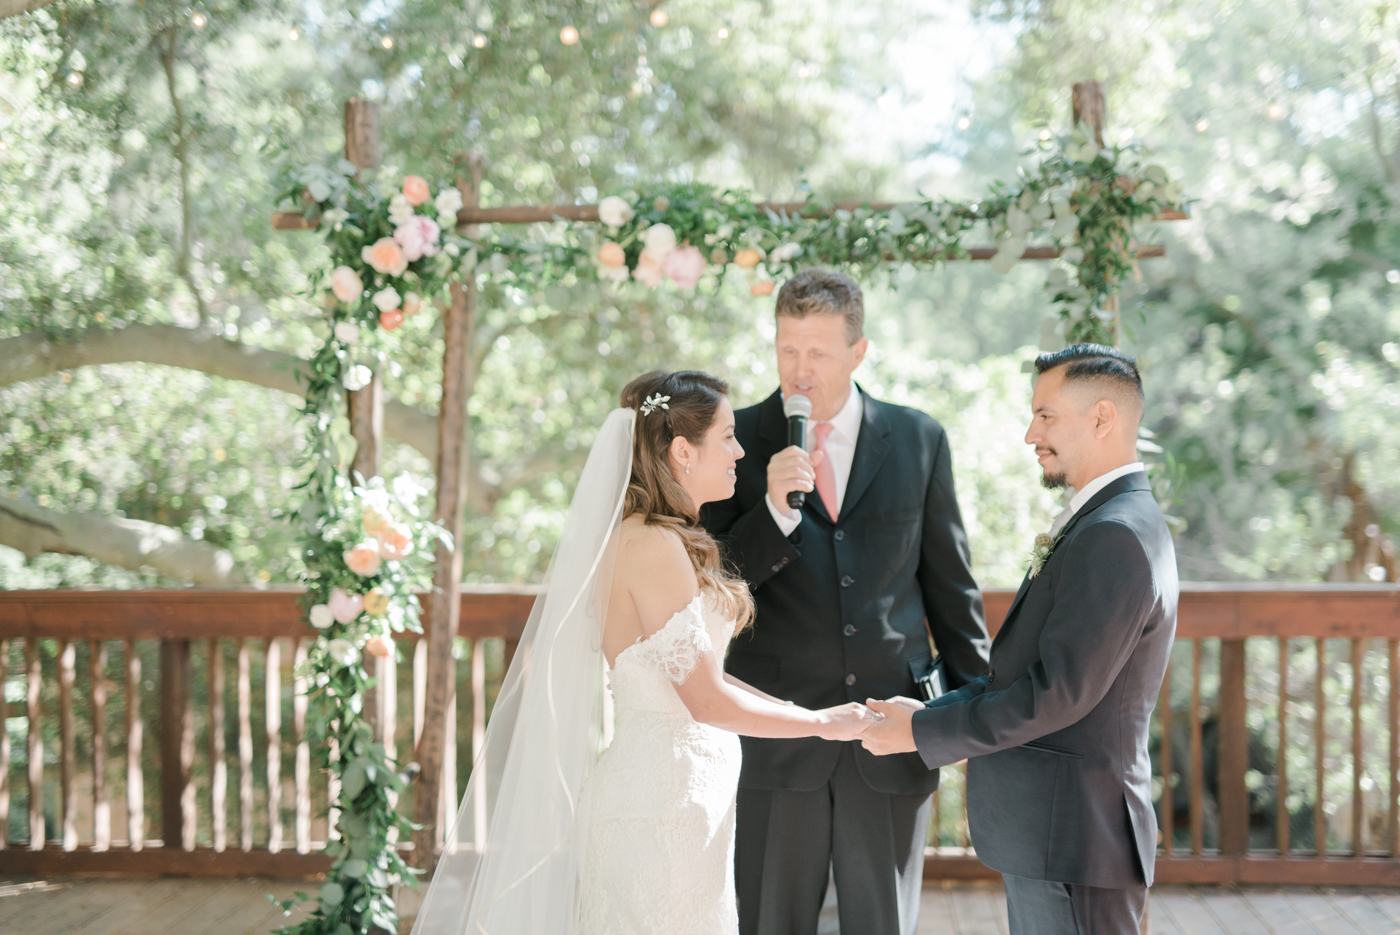 l&c-the_1909_spring_garden_wedding_los_angeles_fine_art_wedding_photographer-13.jpg